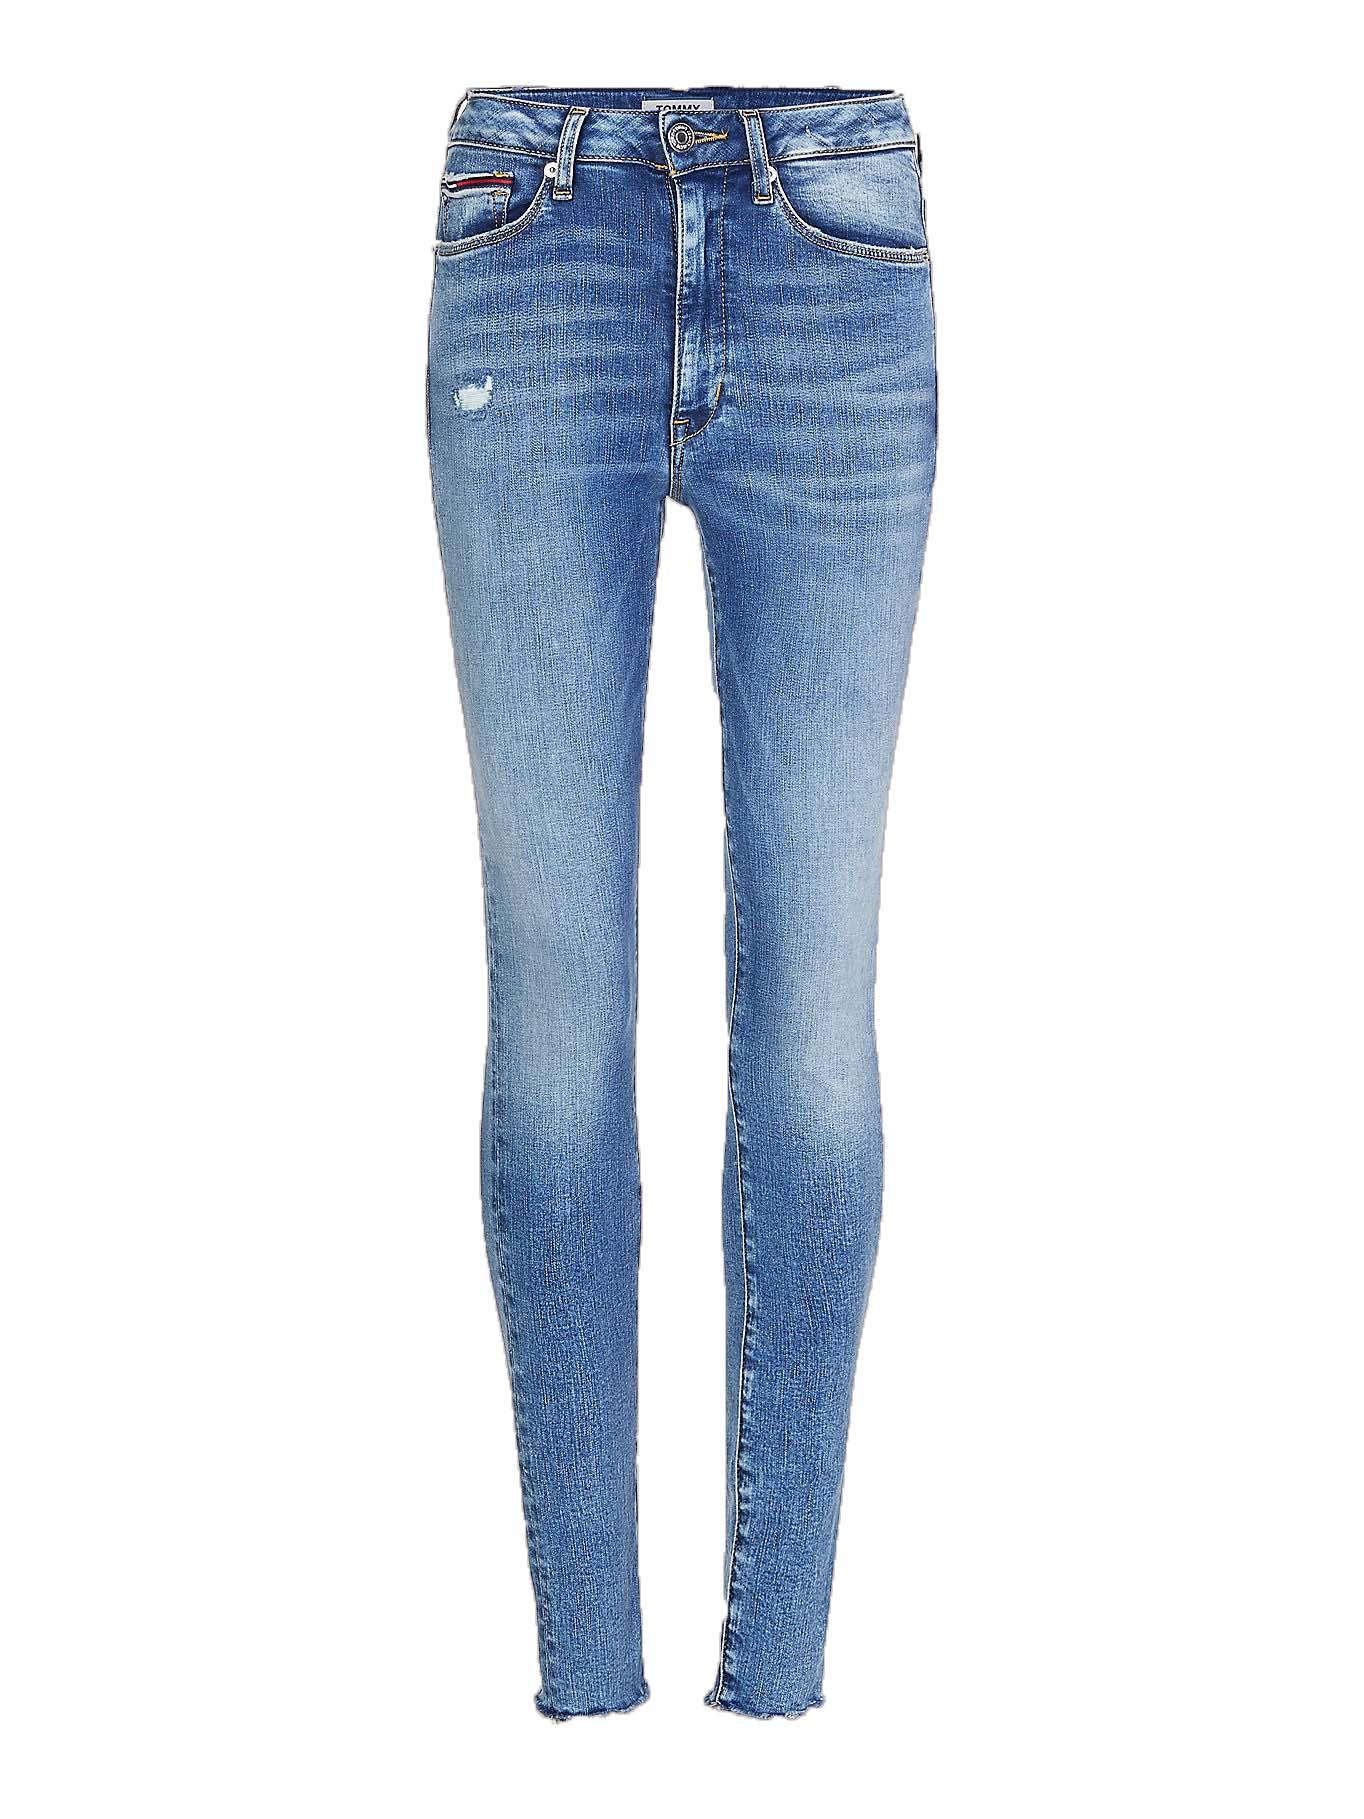 "High Waist Skinny Fit Jeans ""Sylvia"""